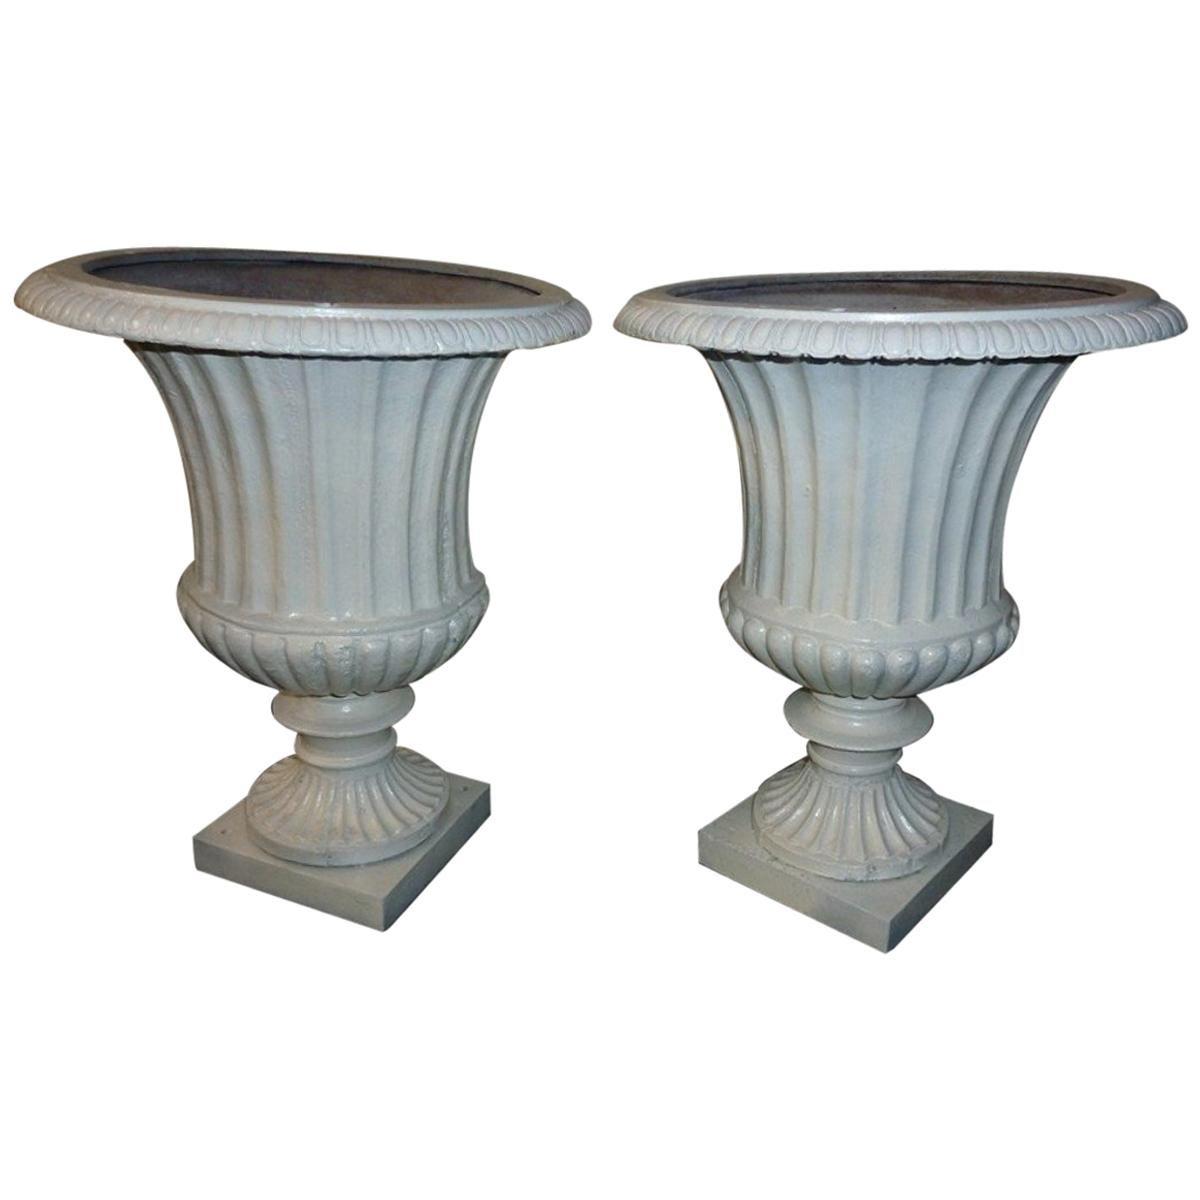 Pair of Medicis Cast Iron Vases, France